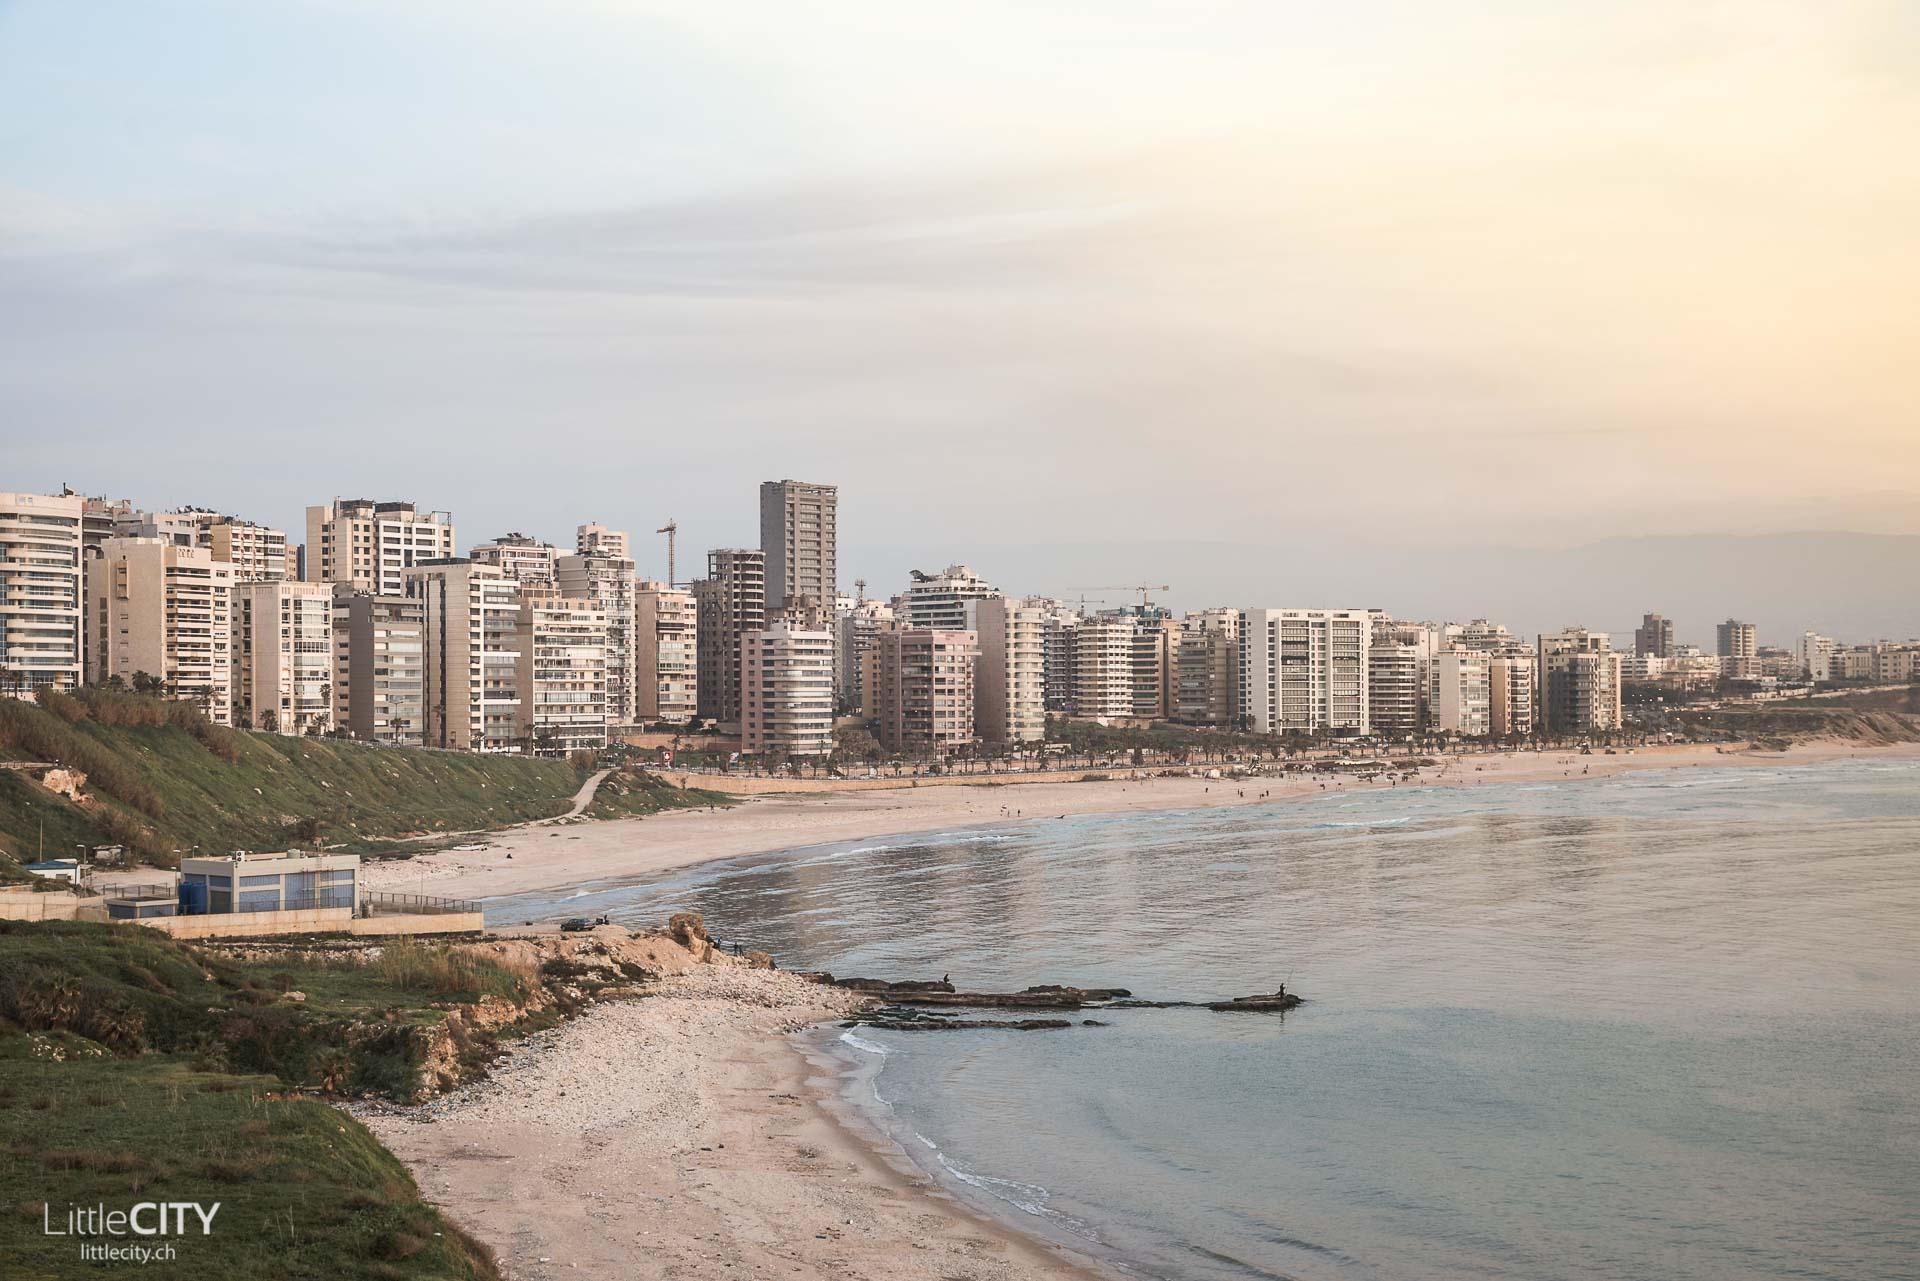 Beirut Reisetipps: Küste am Mittelmeer